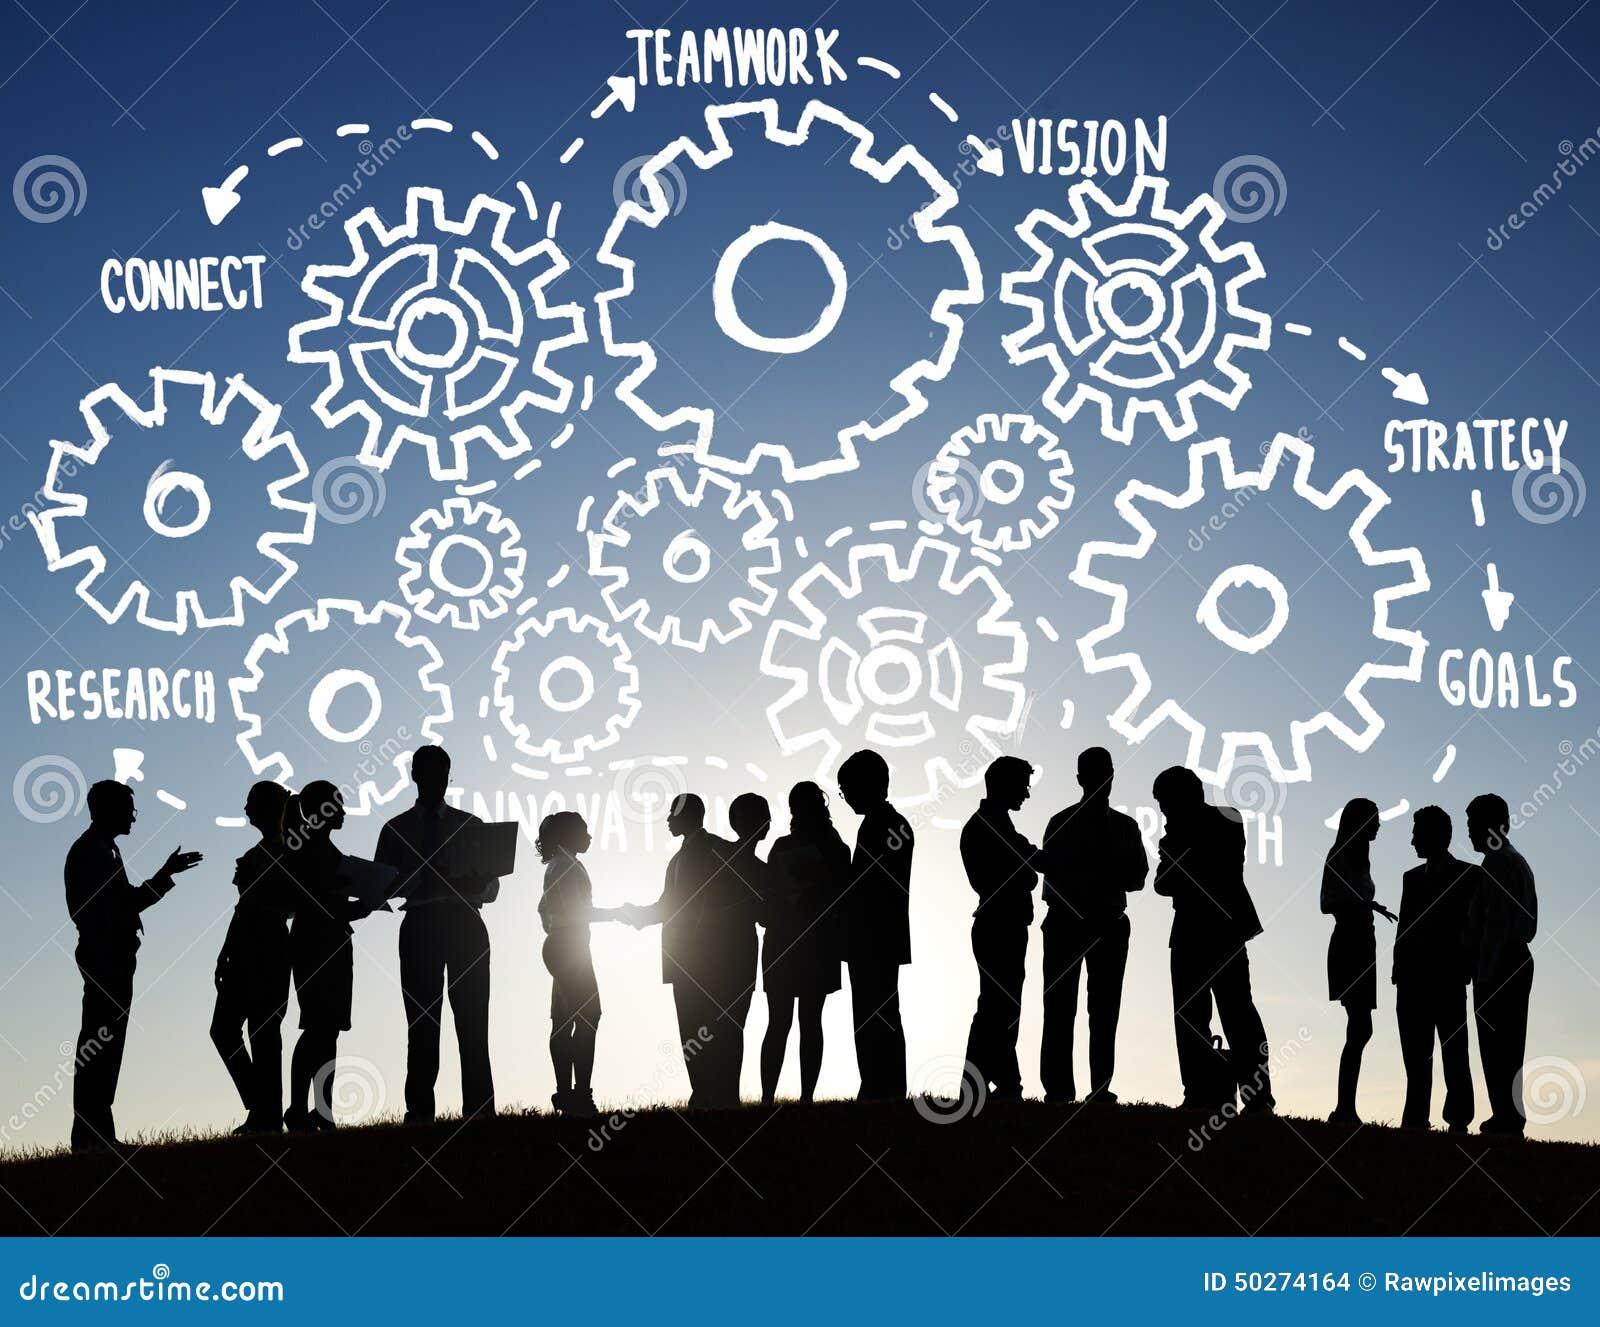 Conceito do apoio às empresas de Team Teamwork Goals Strategy Vision